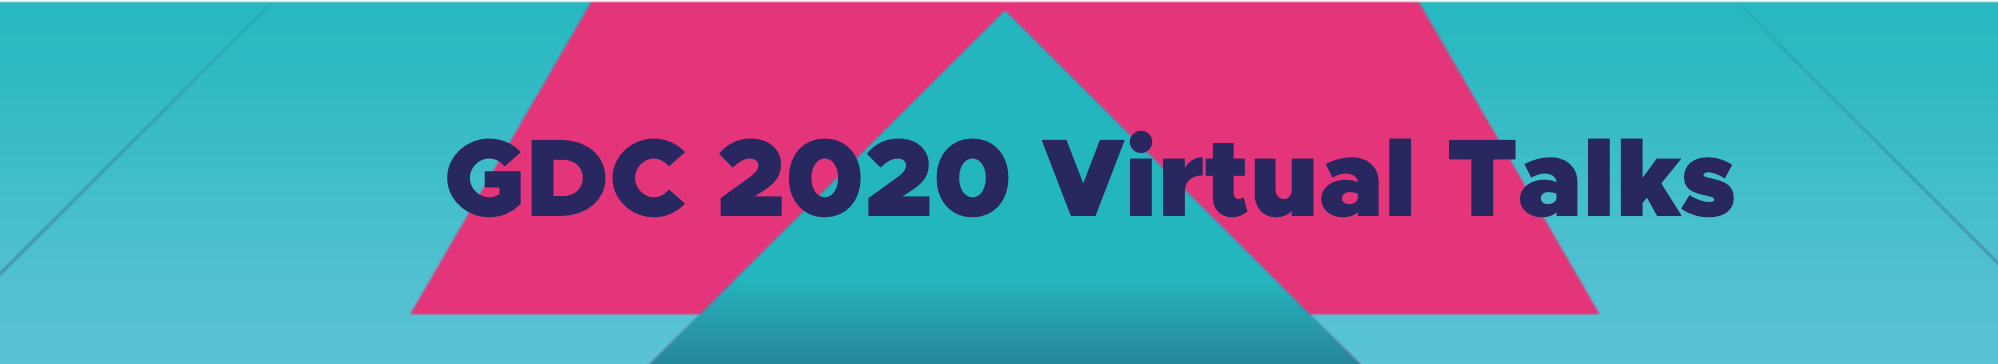 Virtual GDC 2020